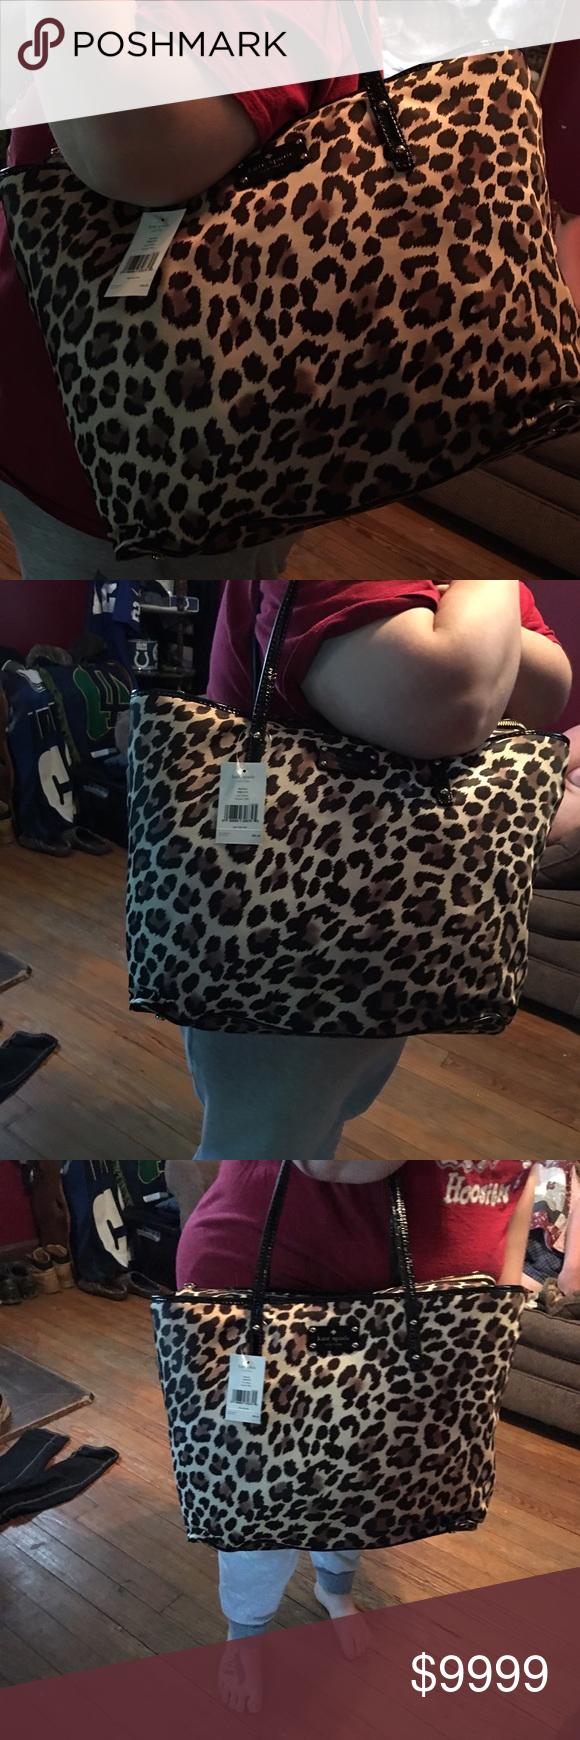 Kate Spade Cheetah print Kate Spade Tote !! kate spade Bags Totes